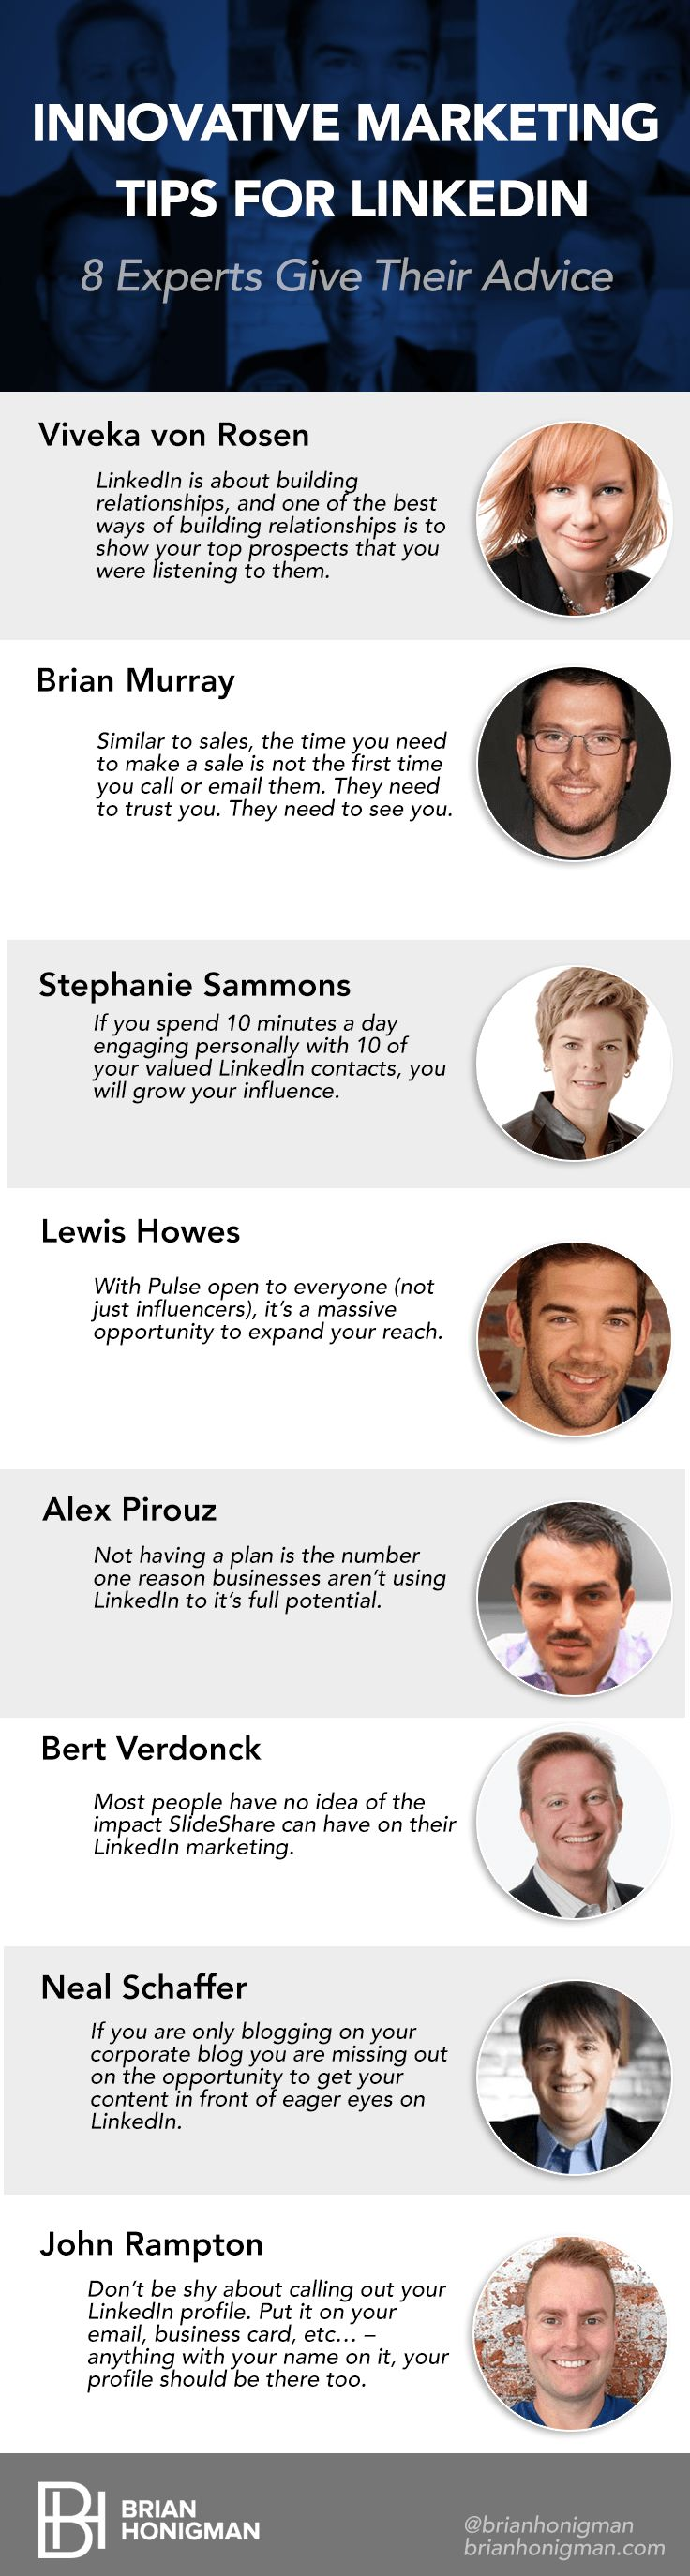 8 Ways to Better Market Yourself on LinkedIn in 2015 via BrianHonigman.com